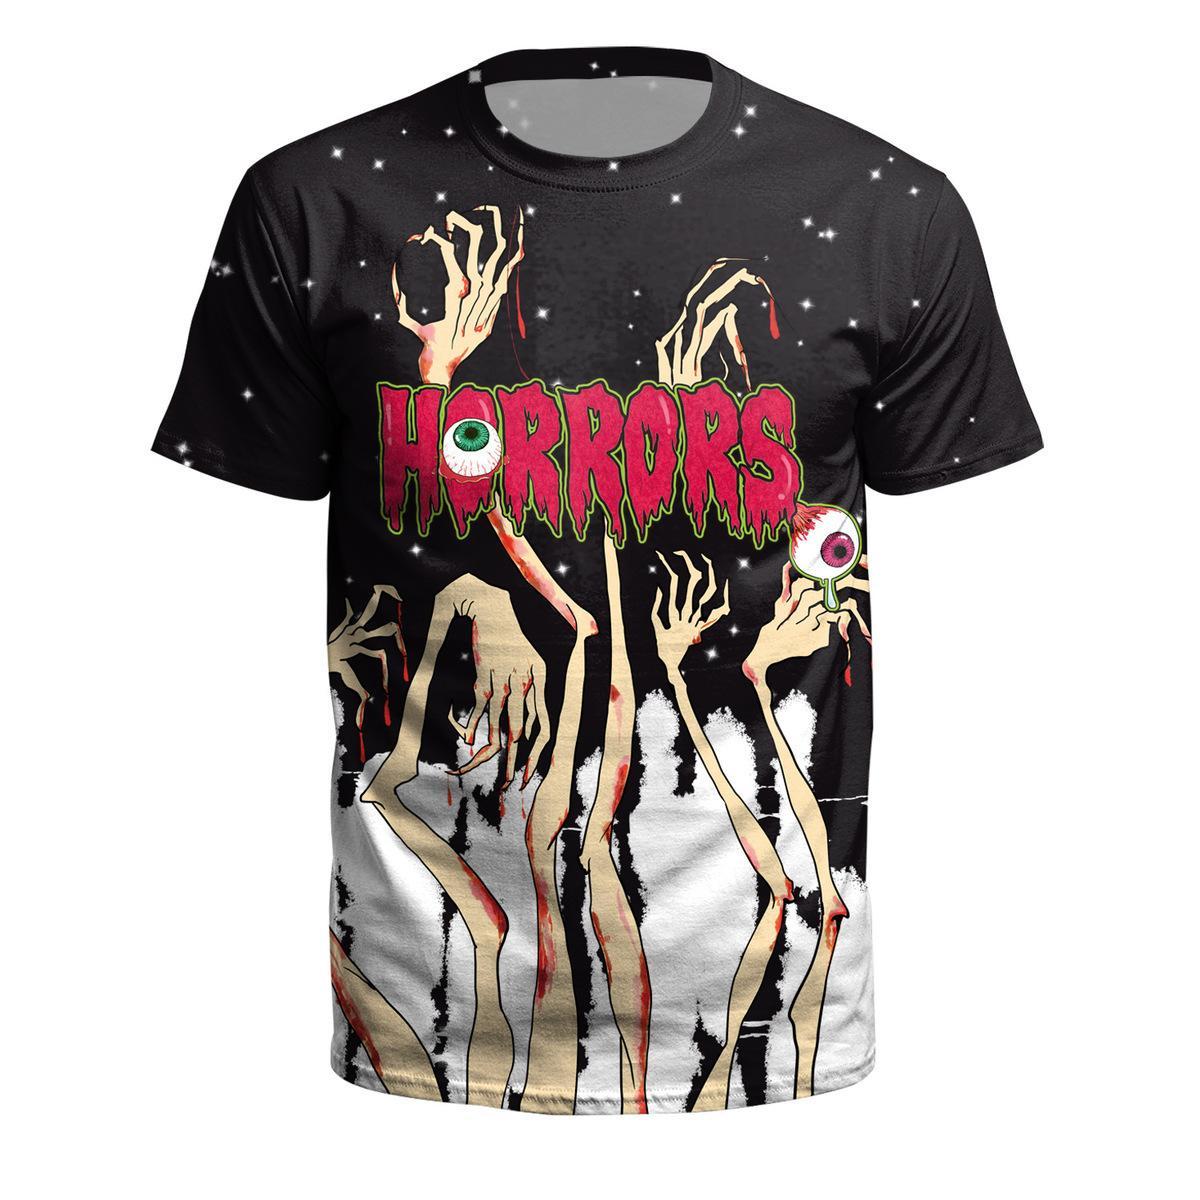 7a175f6e8e0f Satan T Shirt Death Scary Evil Hip Hop Satanism Grim Reaper T Shirt  Supernatura Men/Women Tshirt American Horror Story Online Shopping Tee  Shirts Crazy T ...